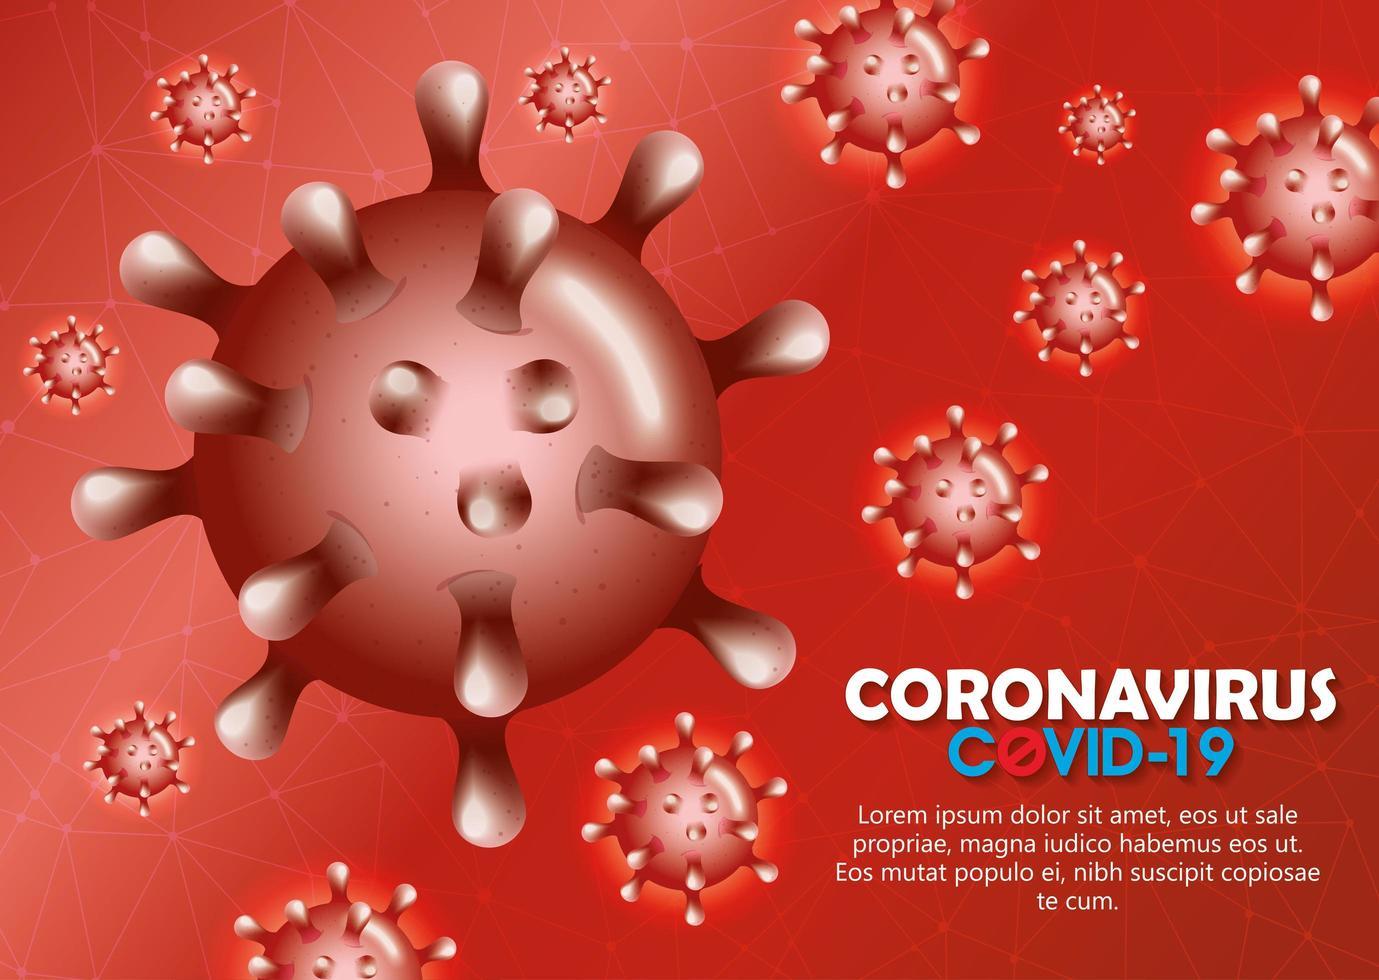 Hintergrund der Coronavirus-Kampagne vektor